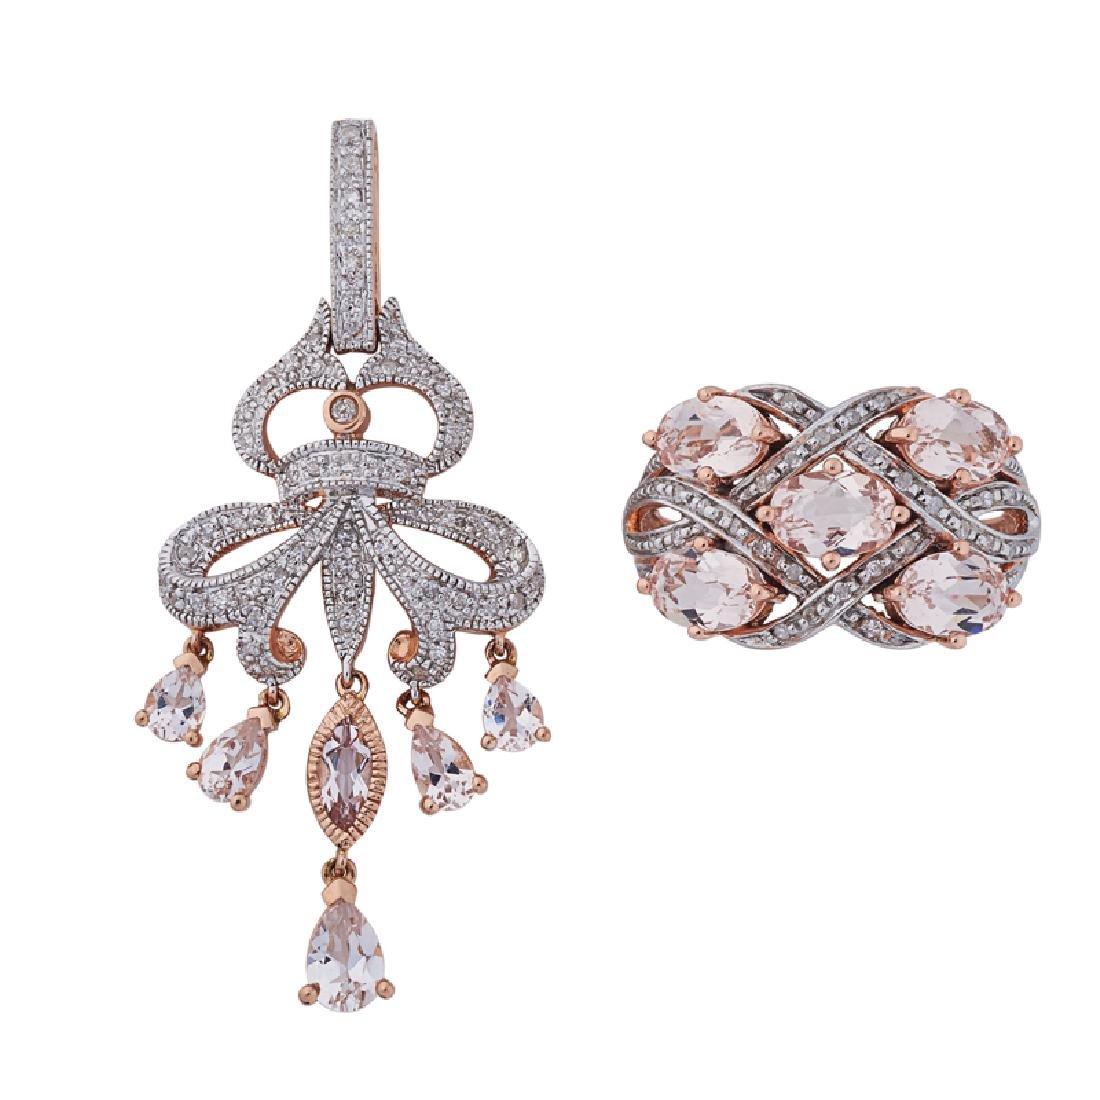 MORGANITE, DIAMOND & PINK GOLD RING & PENDANT